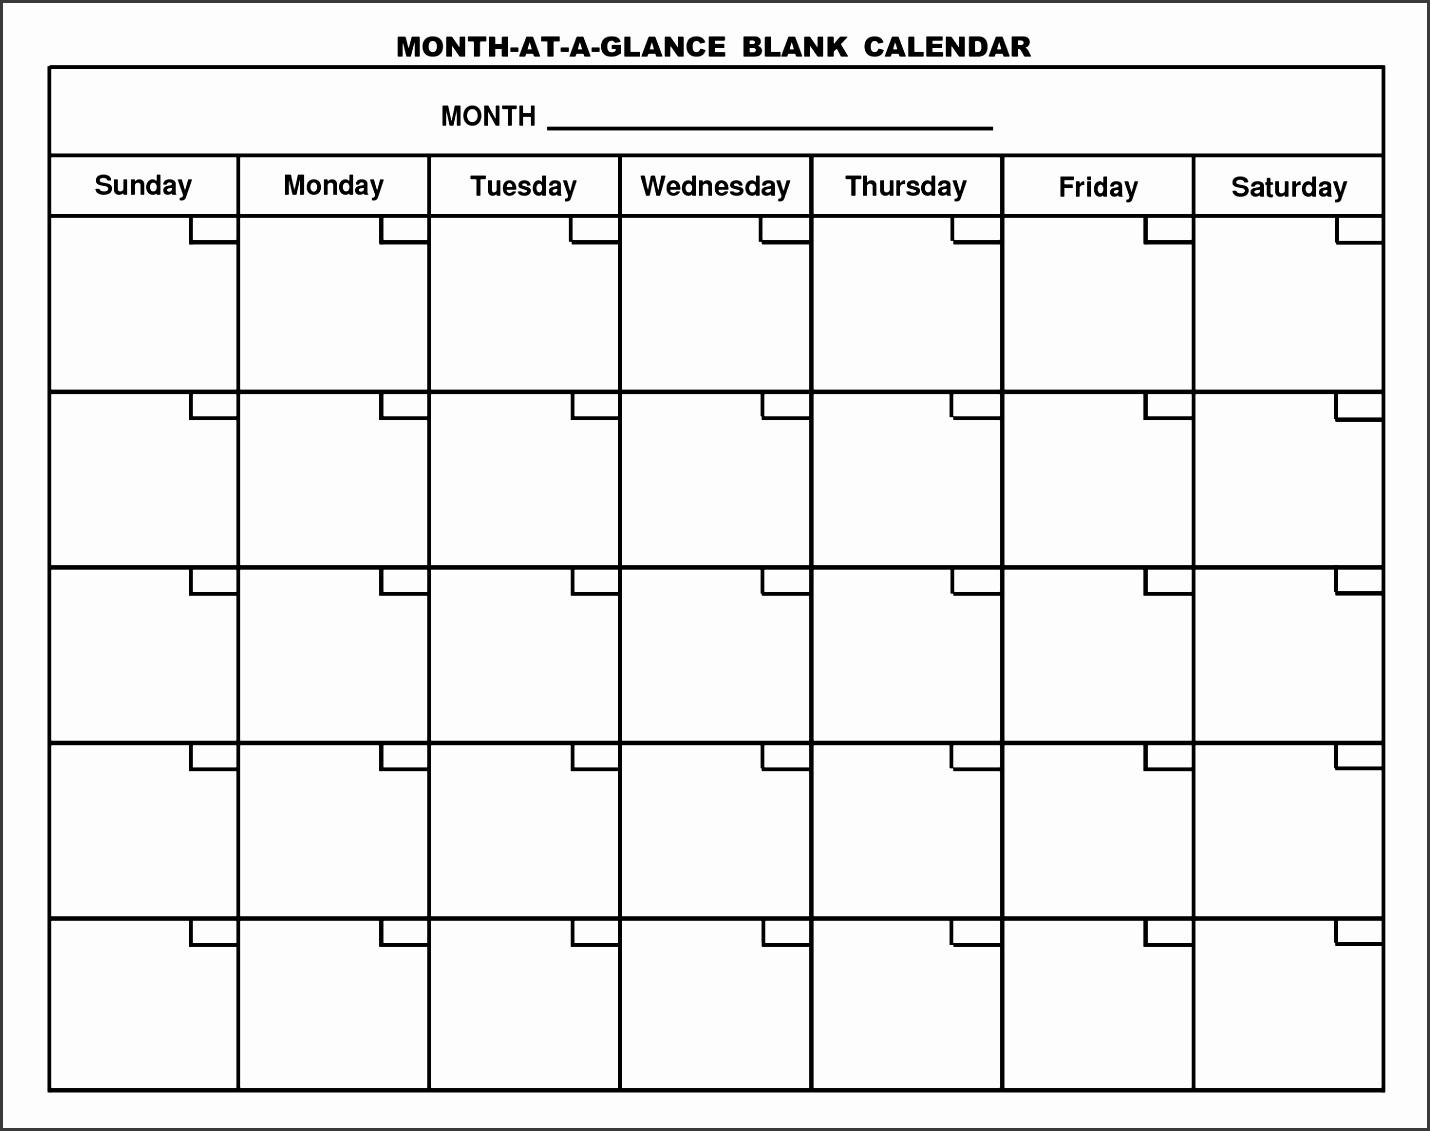 Blank Calendar Template Tristarhomecareinc Blank Calendar Template 1jdkq9mu Blank Calendar Template Mailing Label Template Tristarhomecareinc